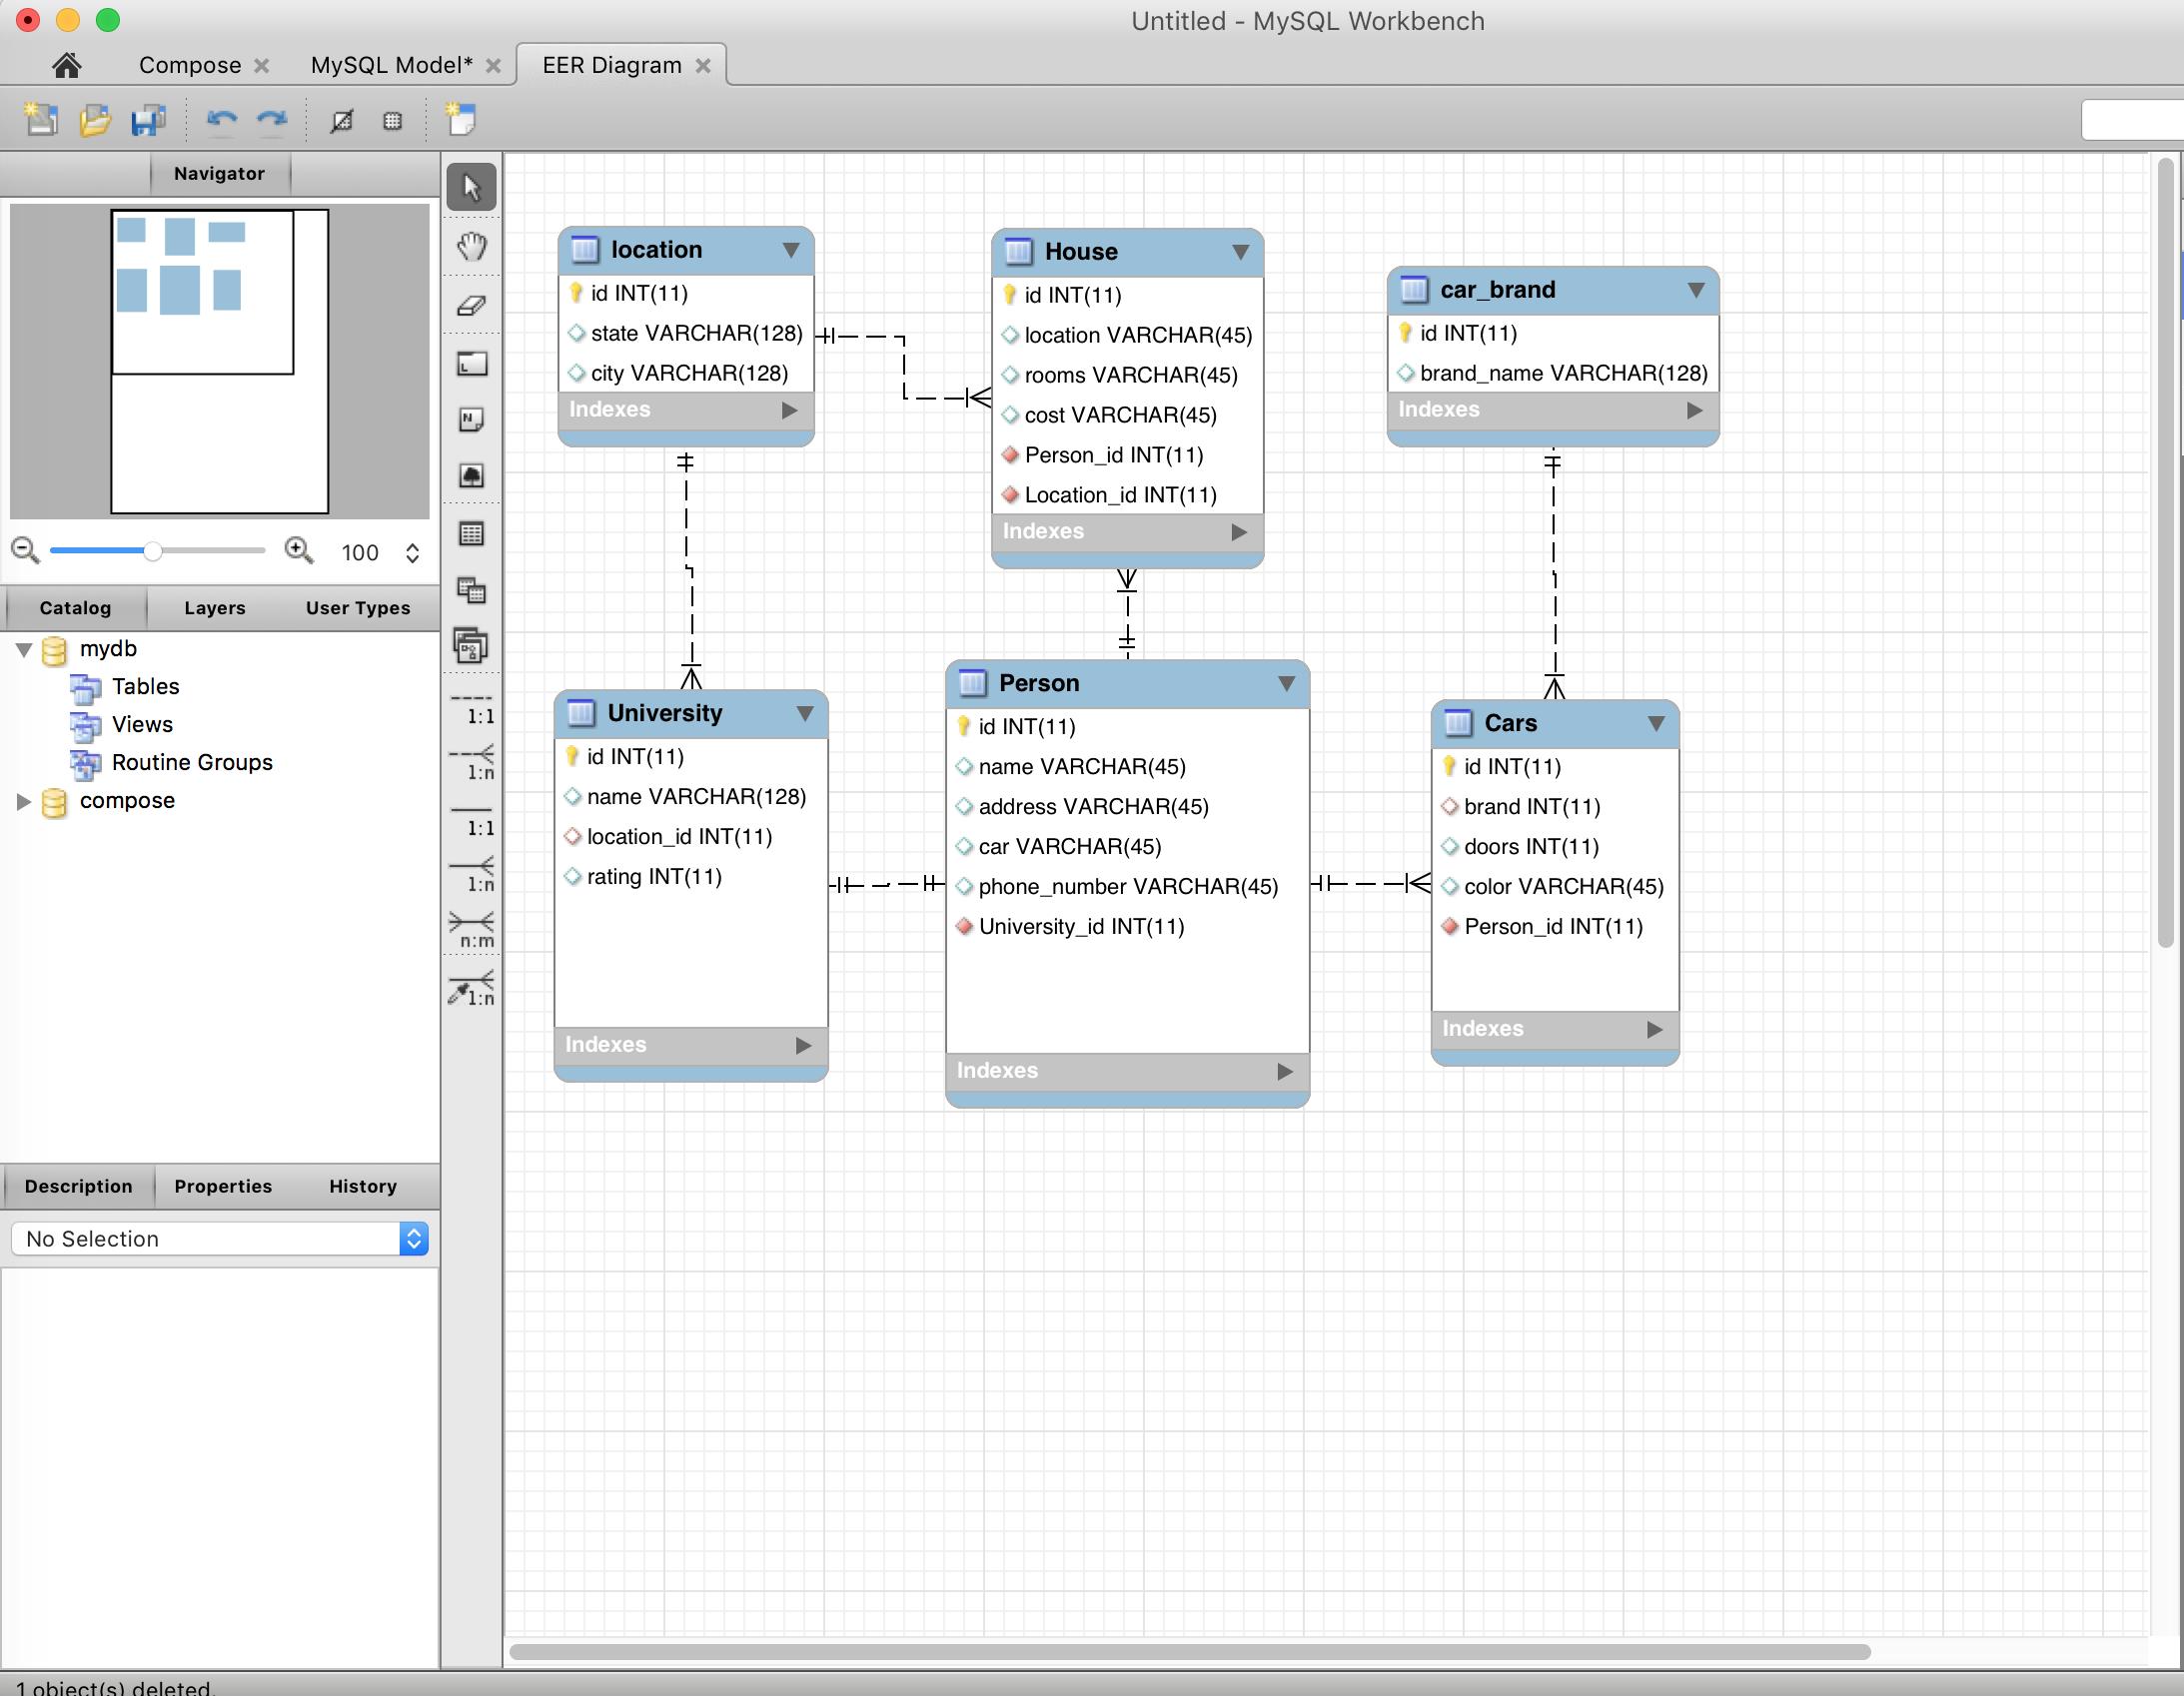 Database Management Tools And Compose For Mysql - Compose regarding Er Diagram In Mysql Workbench